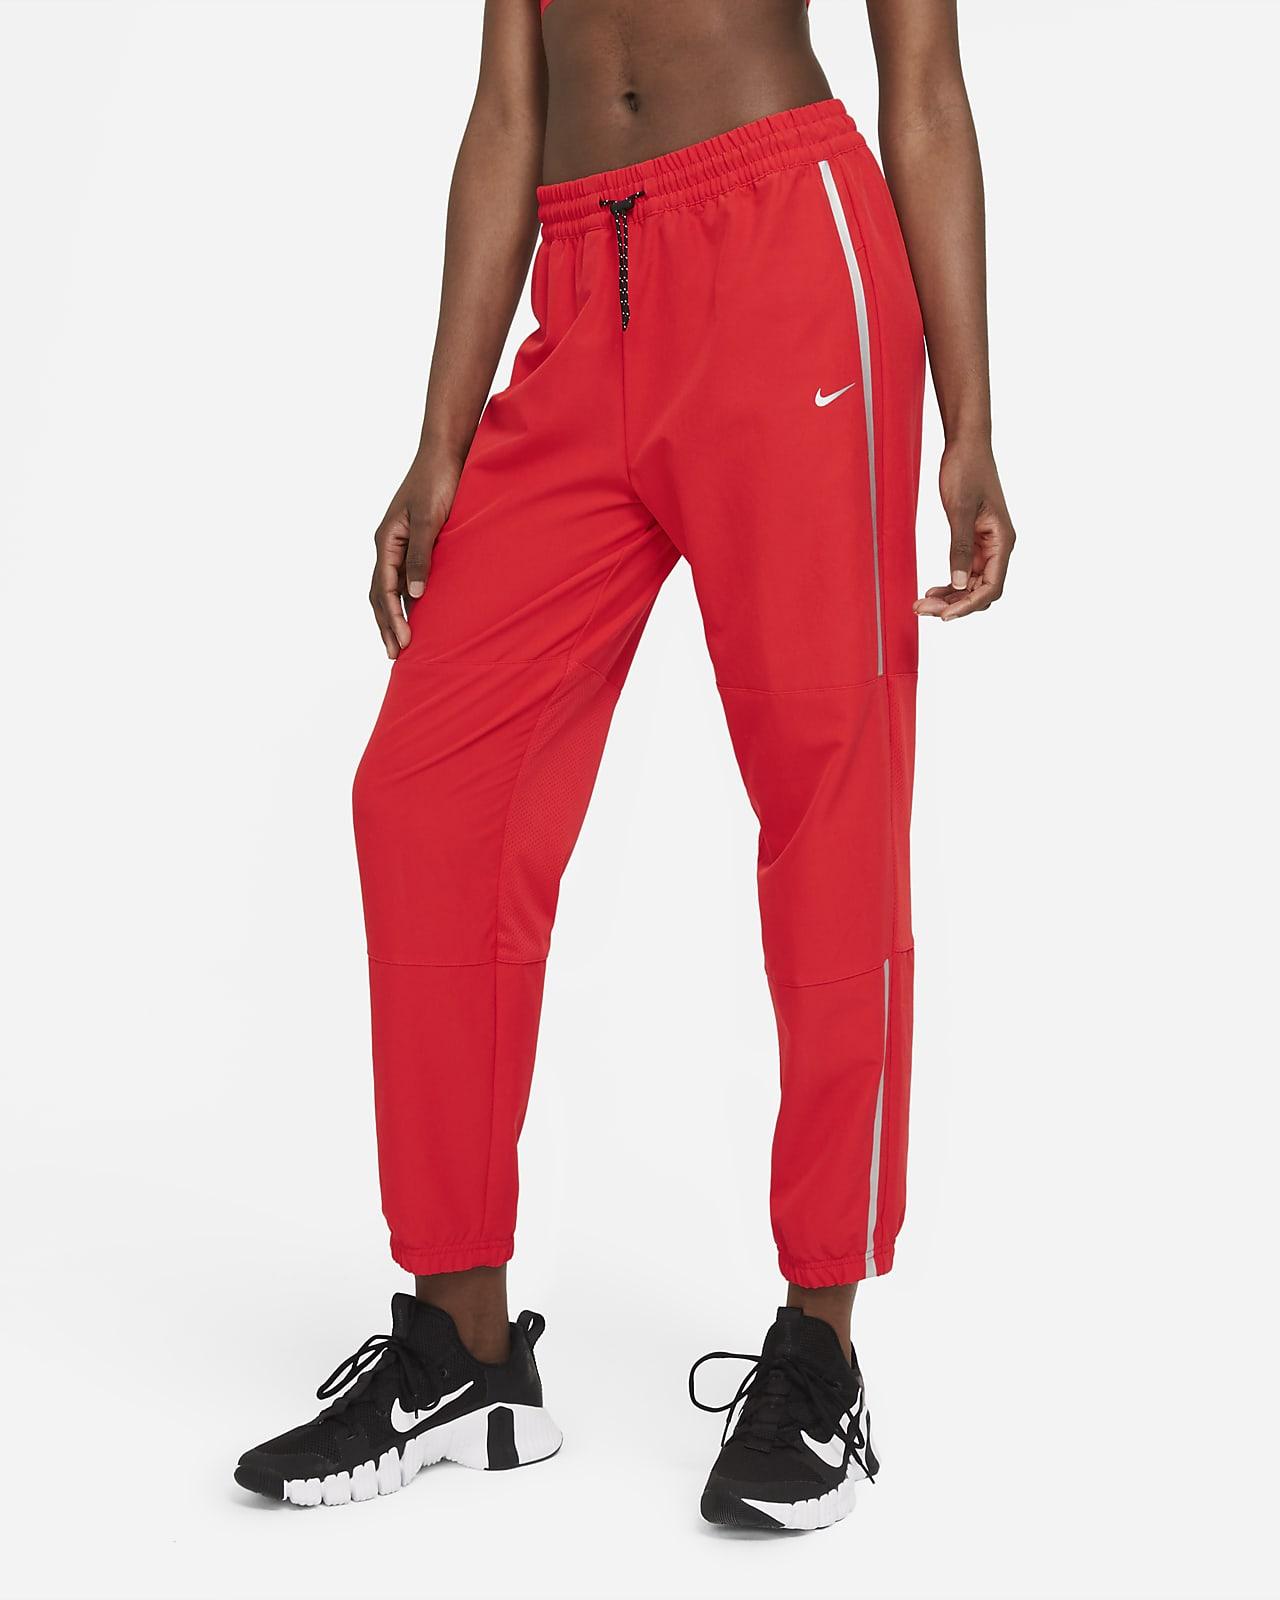 Pantalon tissé Nike Pro pour Femme